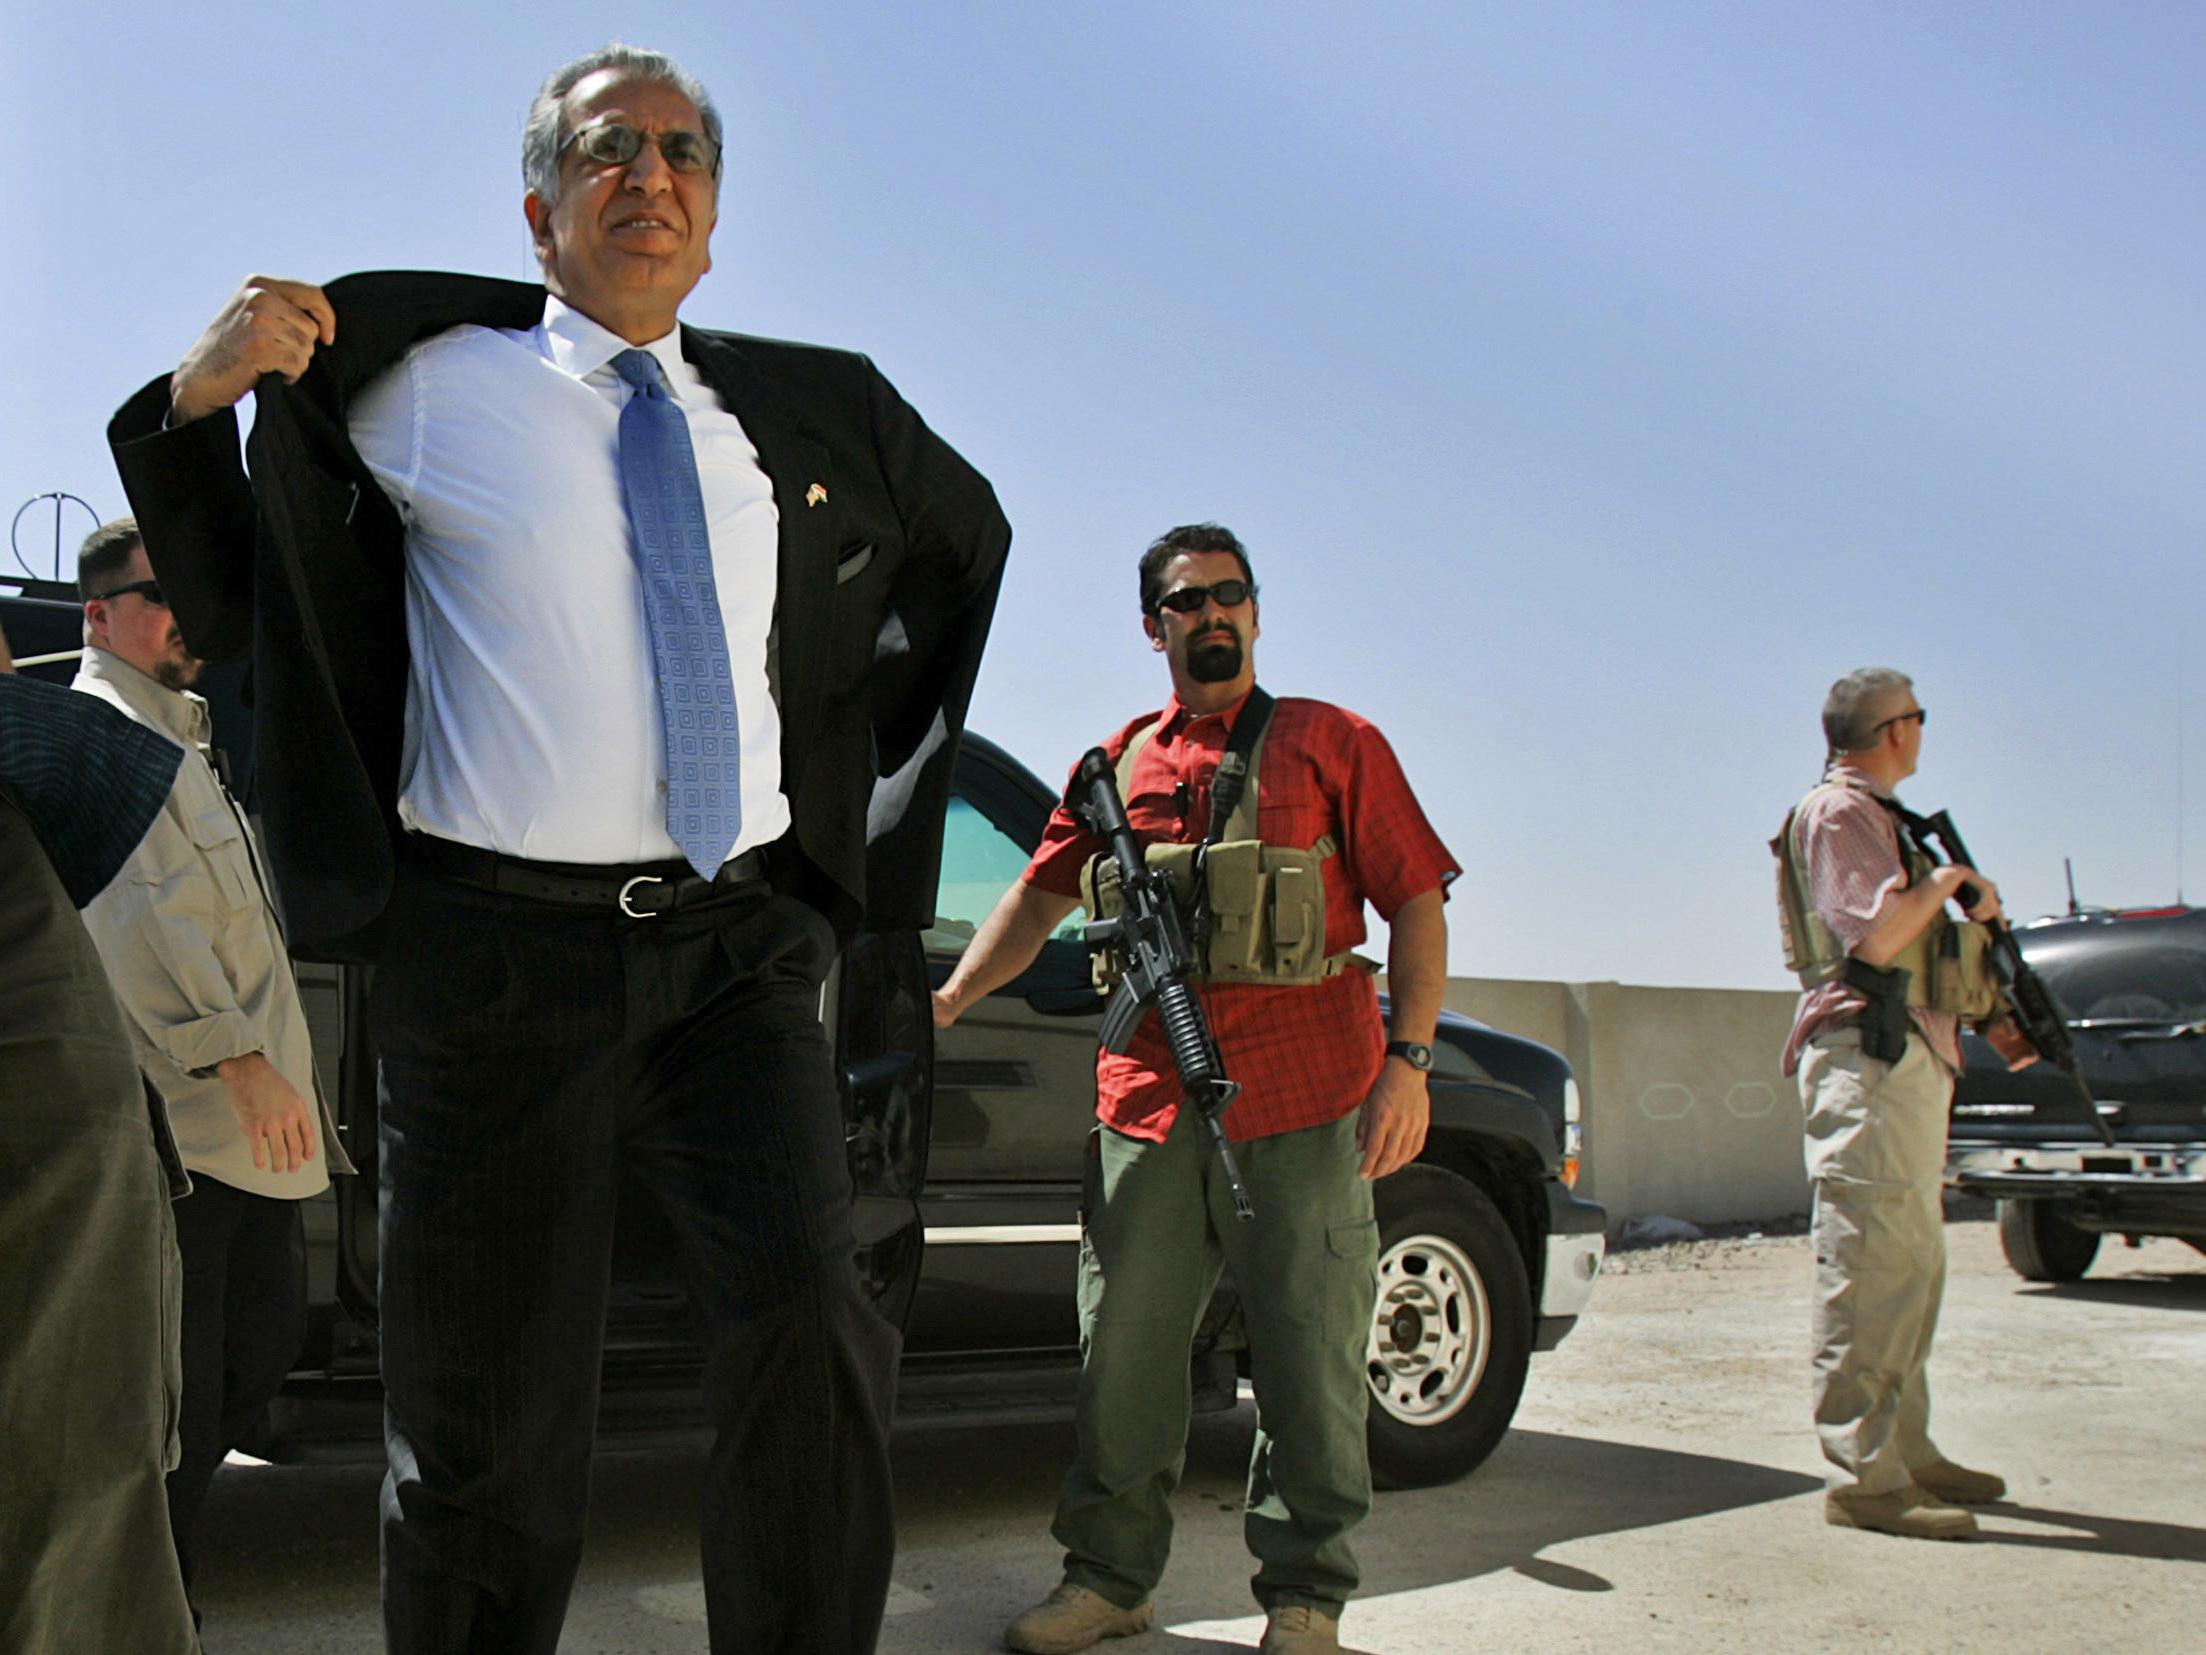 Zalmay Khalilzad Appointed As U.S. Special Adviser To Afghanistan : NPR